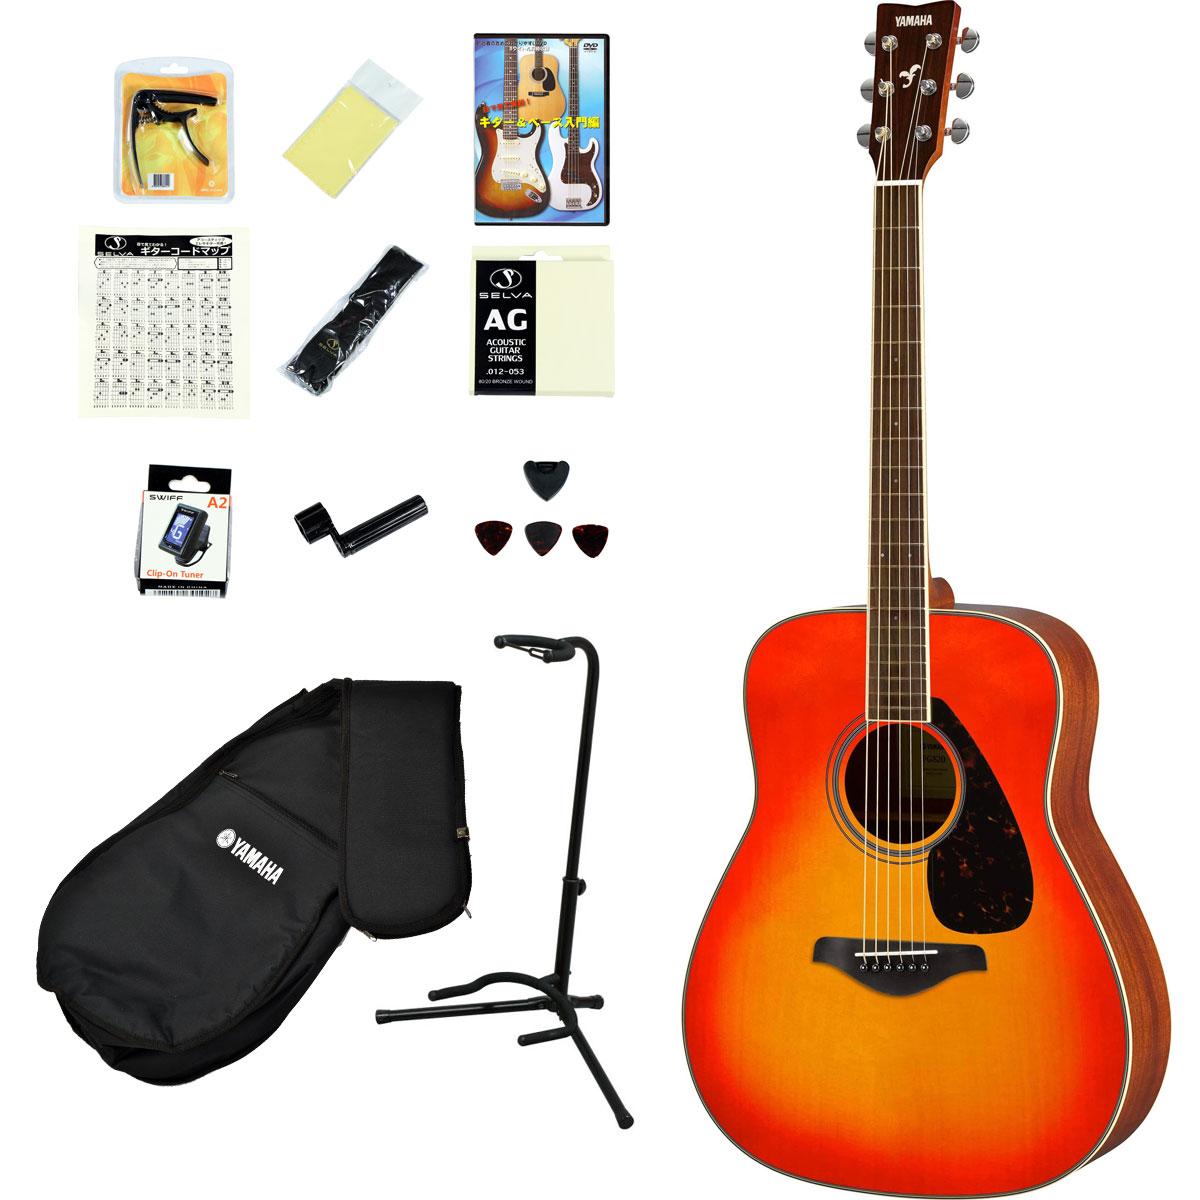 YAMAHA / FG820 AB(オータムバースト) 【アコースティックギター14点入門セット!】 ヤマハ フォークギター アコギ FG-820 入門 初心者【YRK】